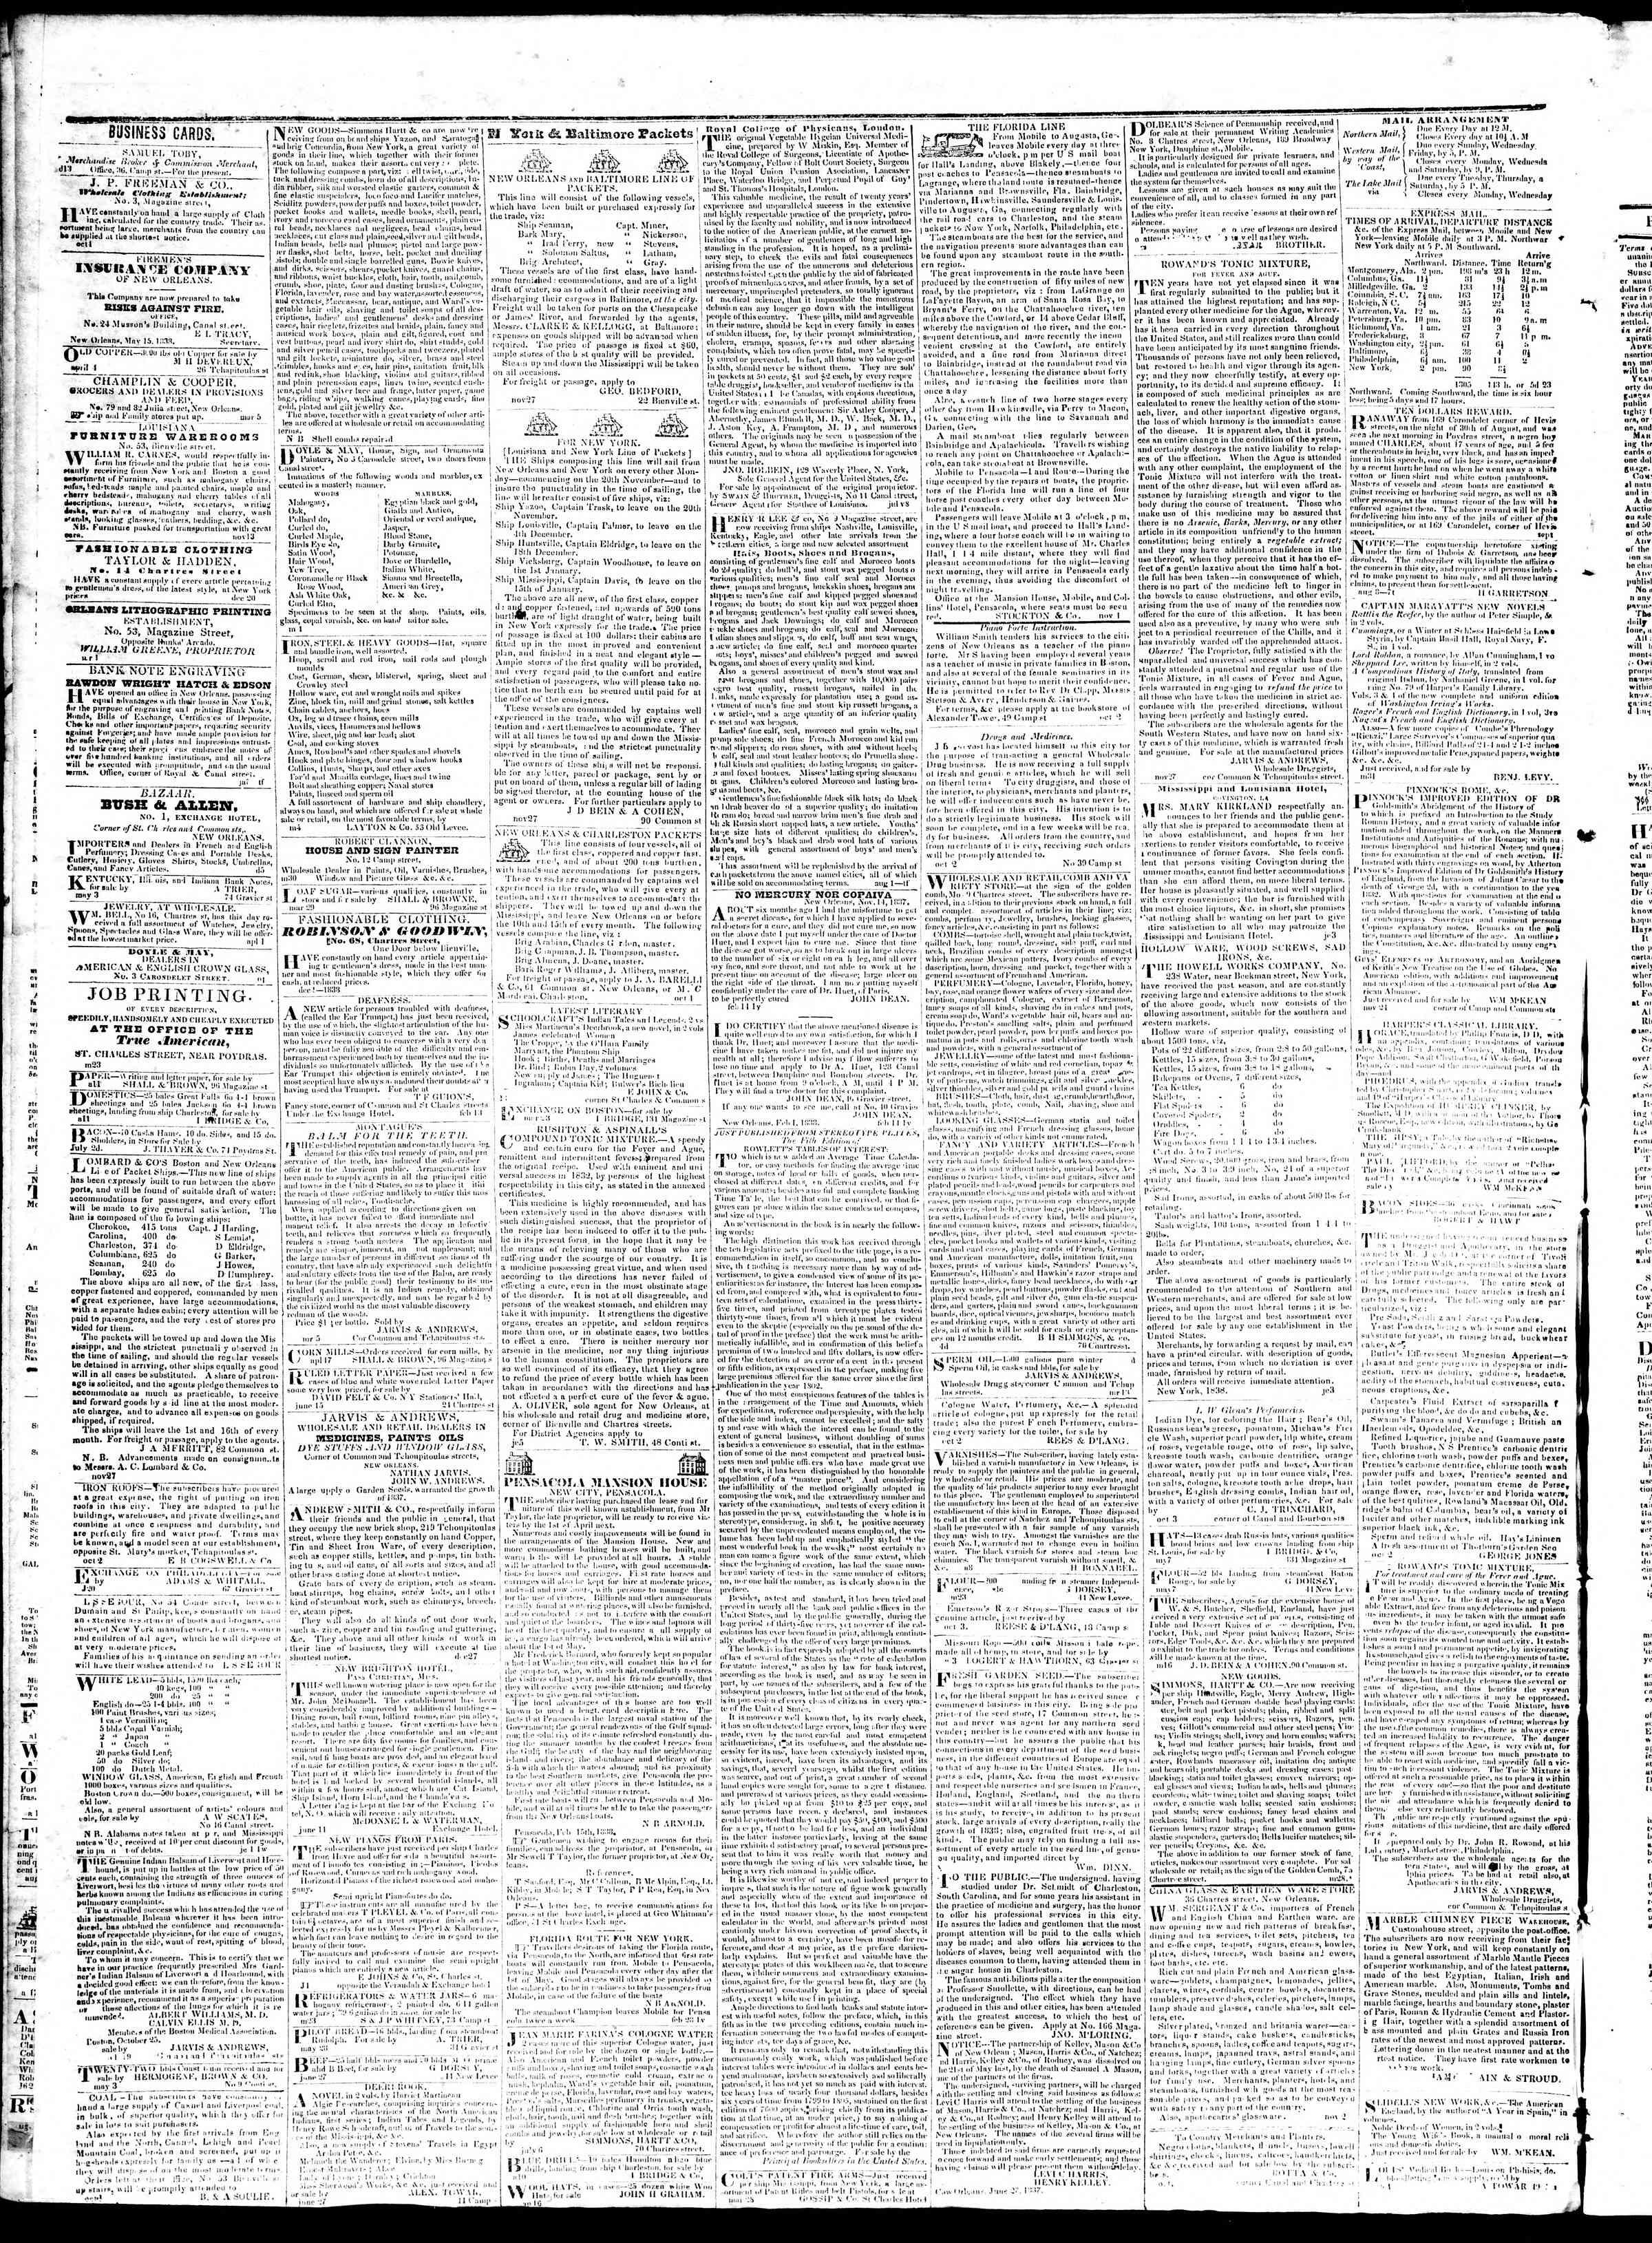 August 17, 1839 Tarihli True American Gazetesi Sayfa 4